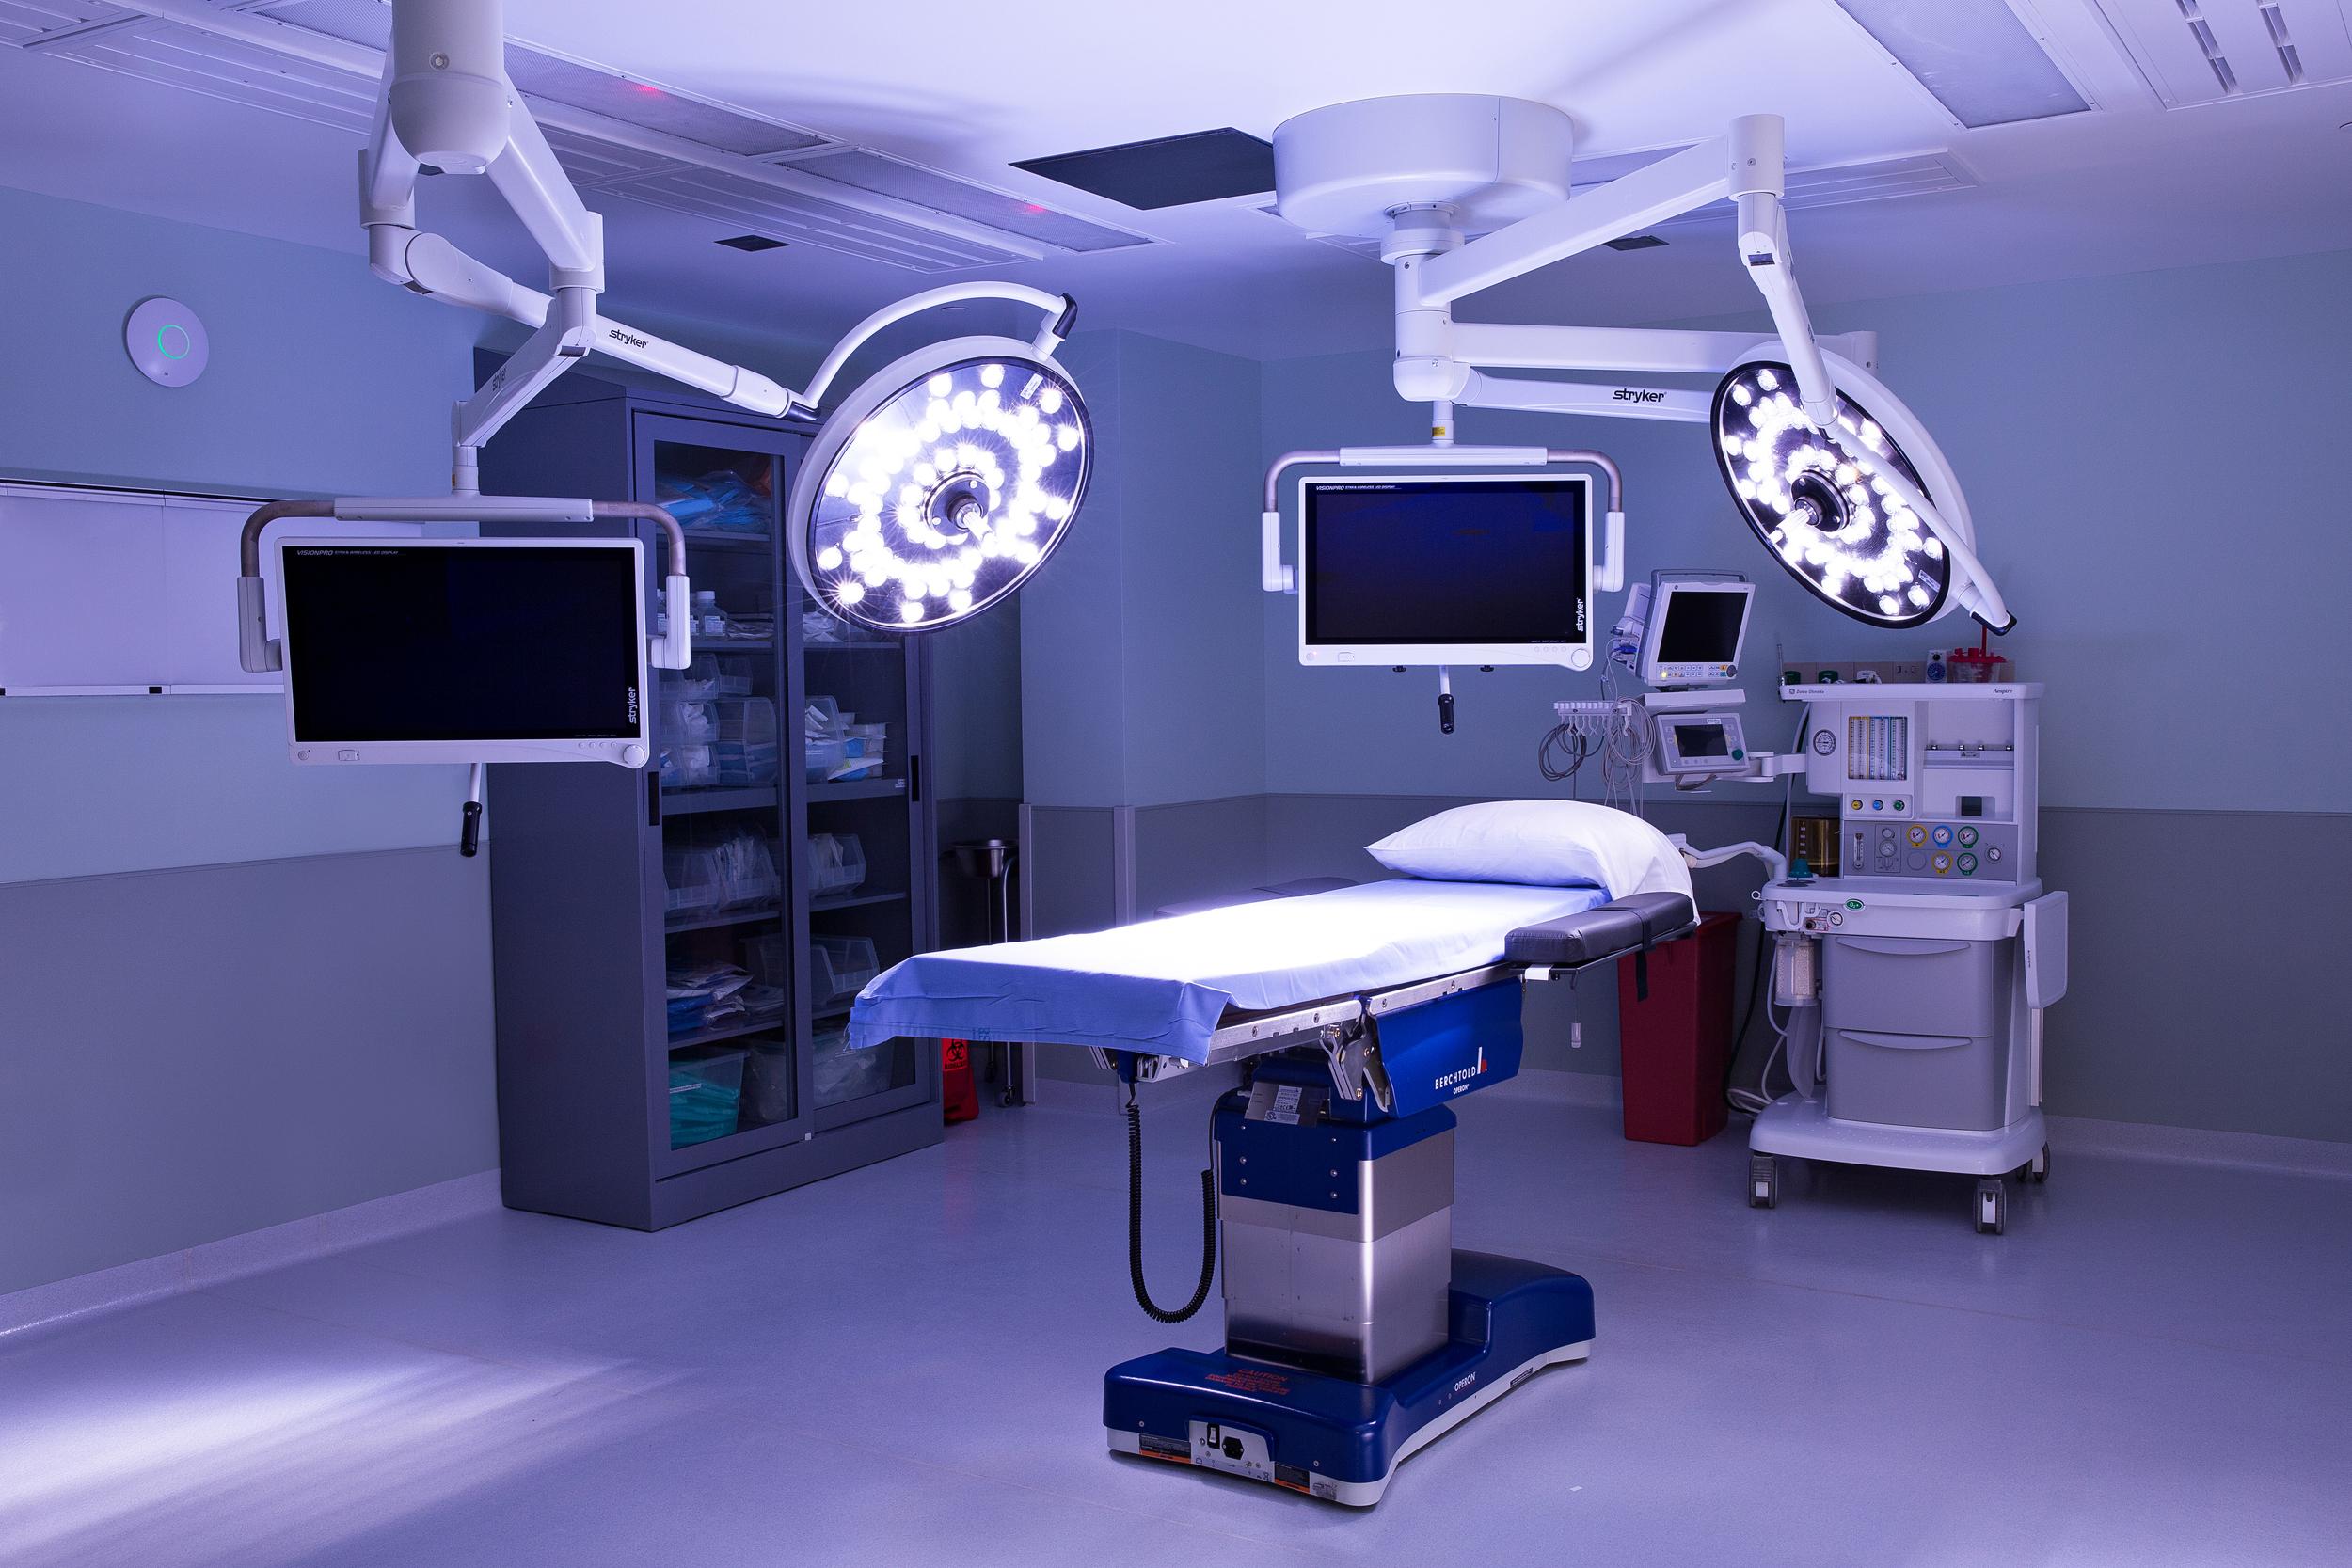 surgerycenter_075_edit.jpg